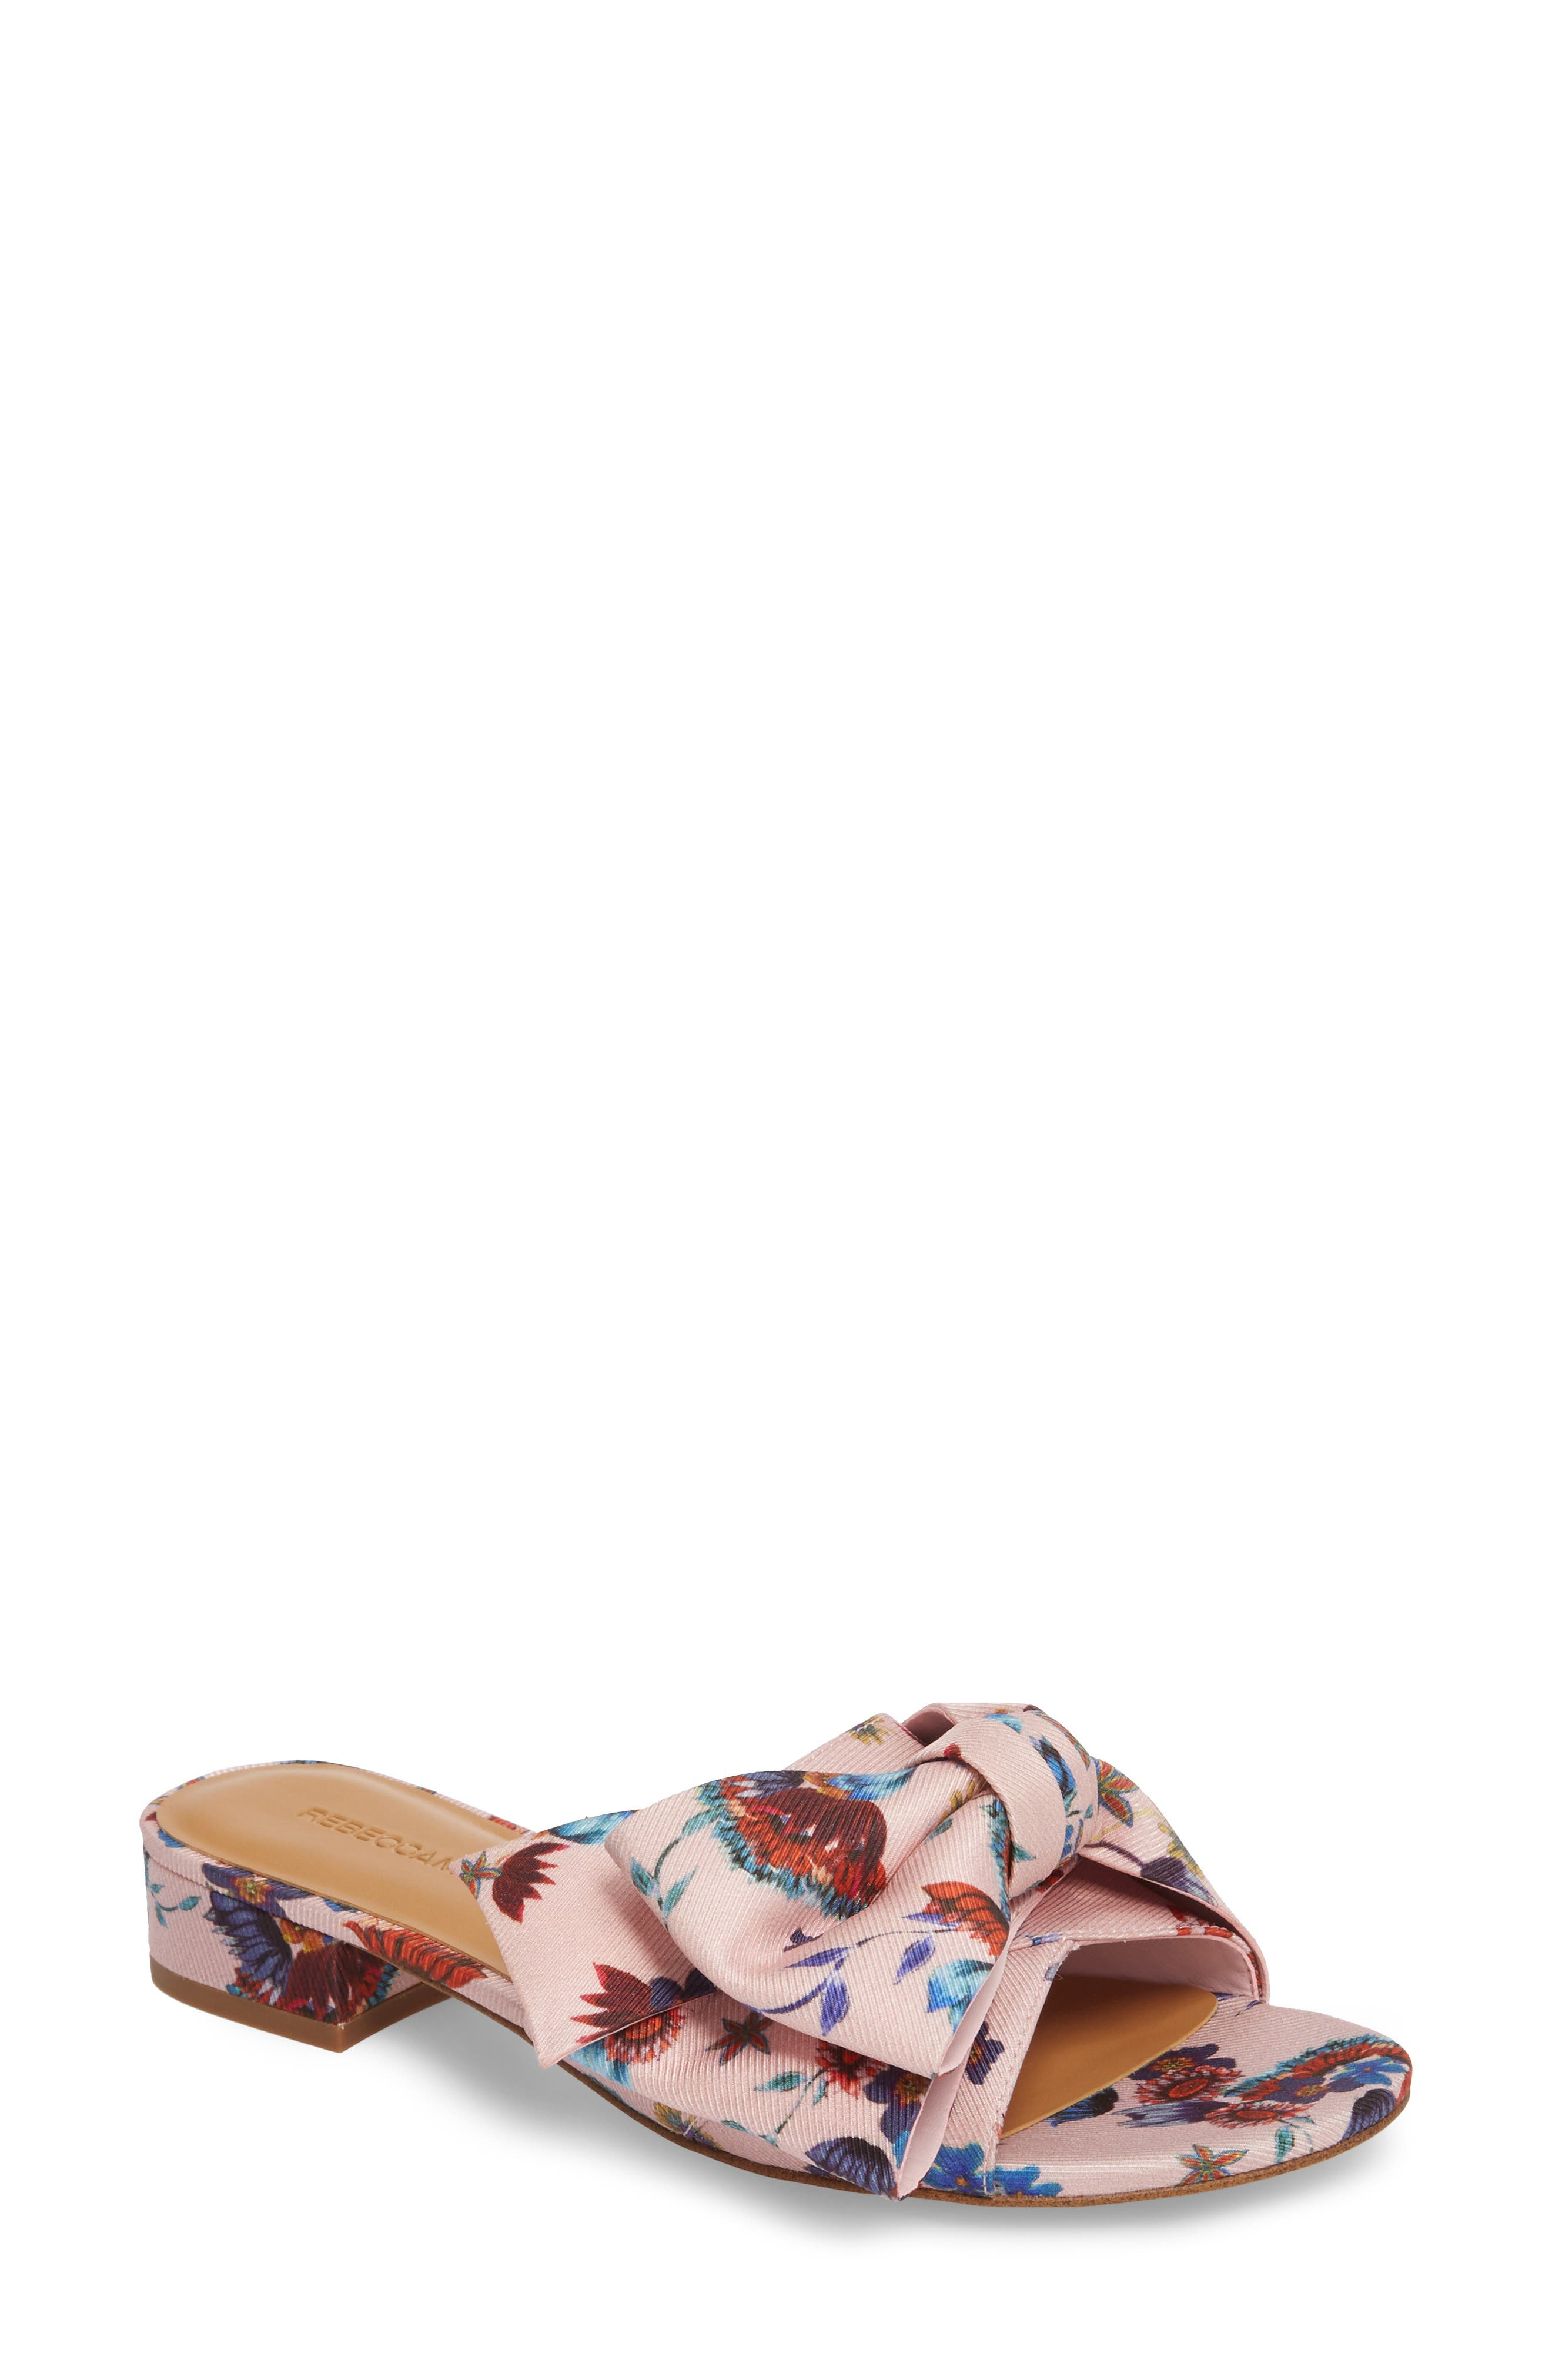 Calista Slide Sandal,                             Main thumbnail 1, color,                             Millennial Pink Multi Fabric